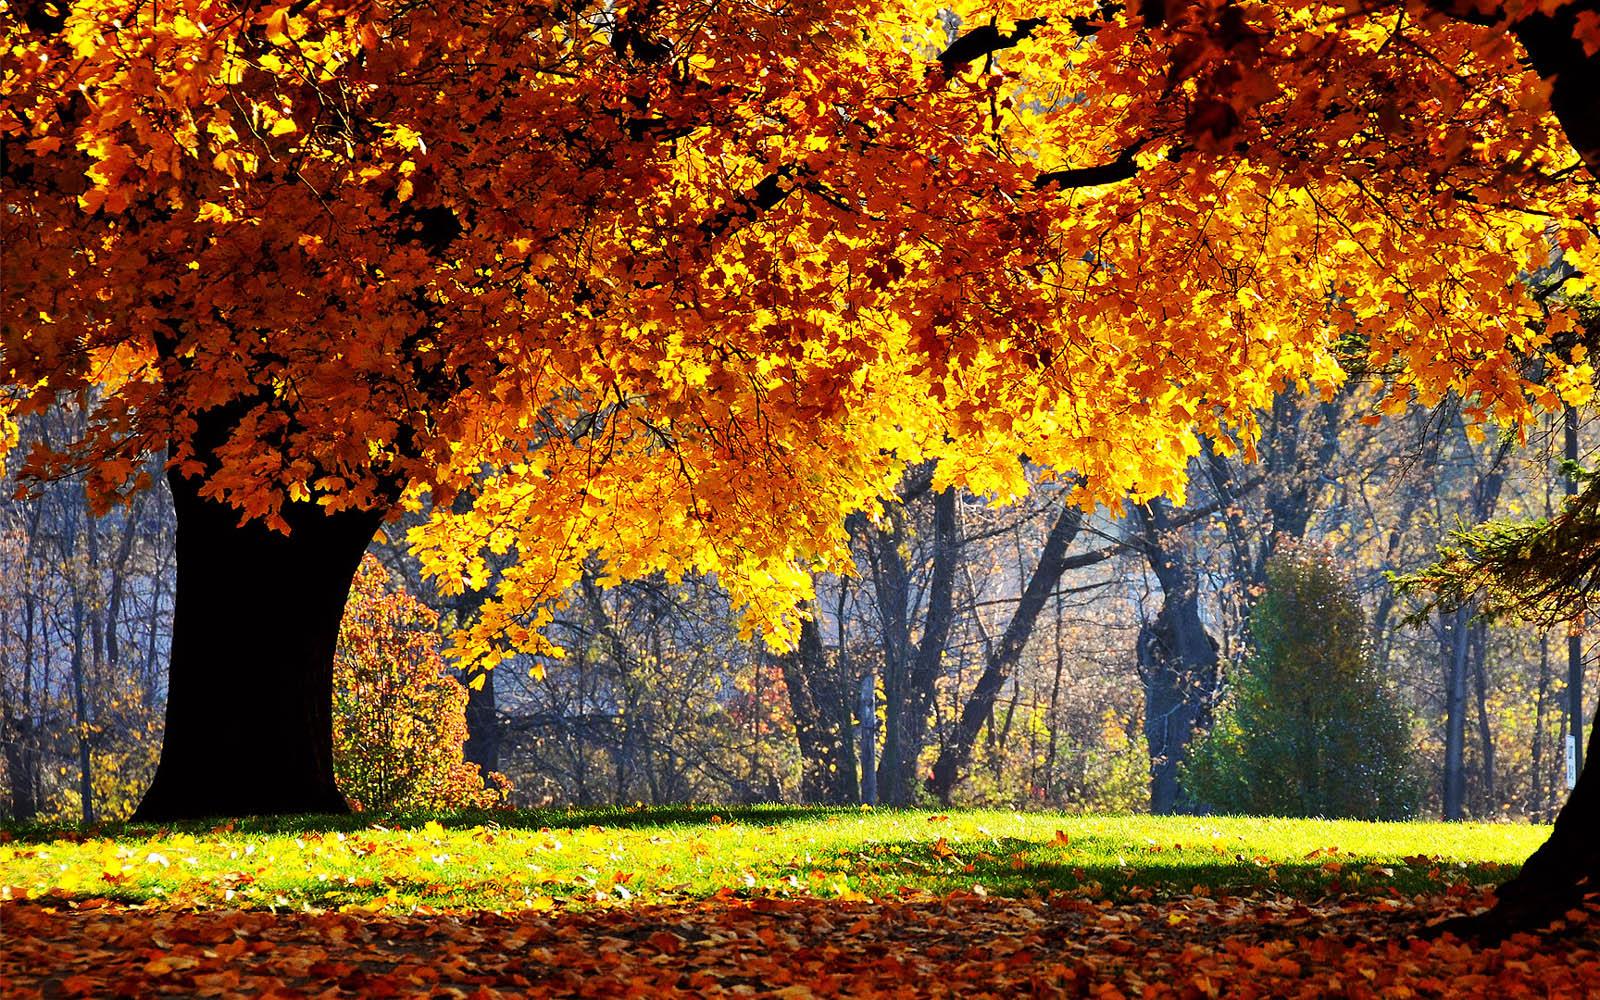 XS Wallpapers HD Beautiful Autumn Scenery Wallpapers 1600x1000